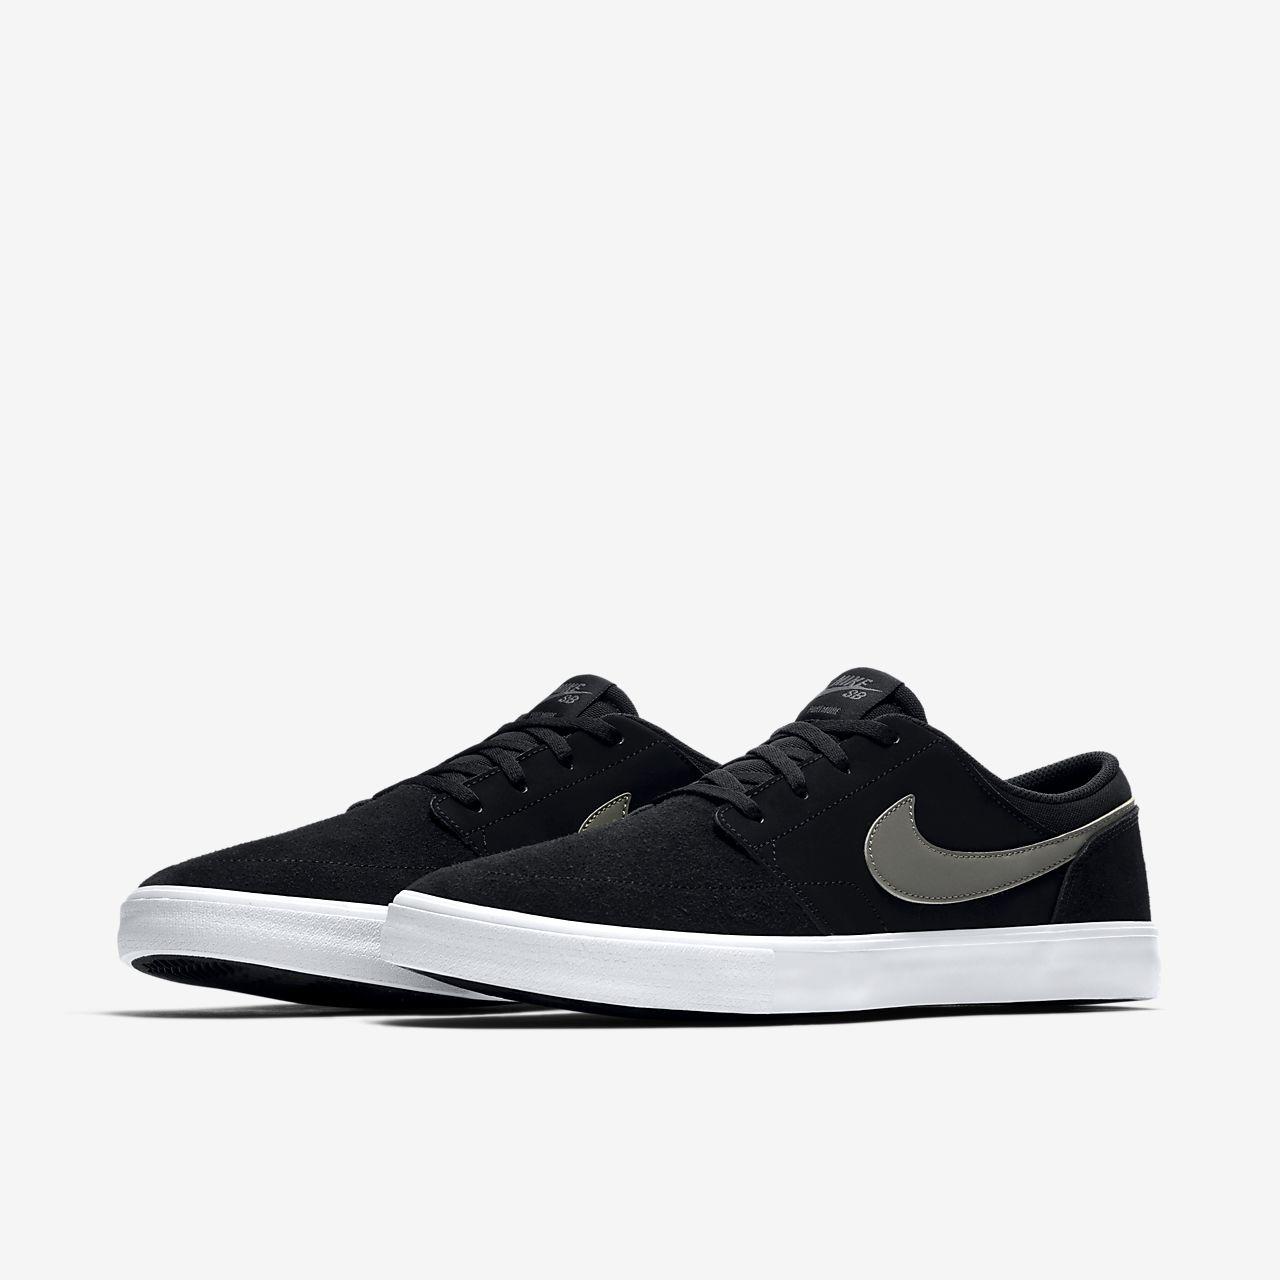 Nike SB Solarsoft Portmore II Mid Schuh (black white)